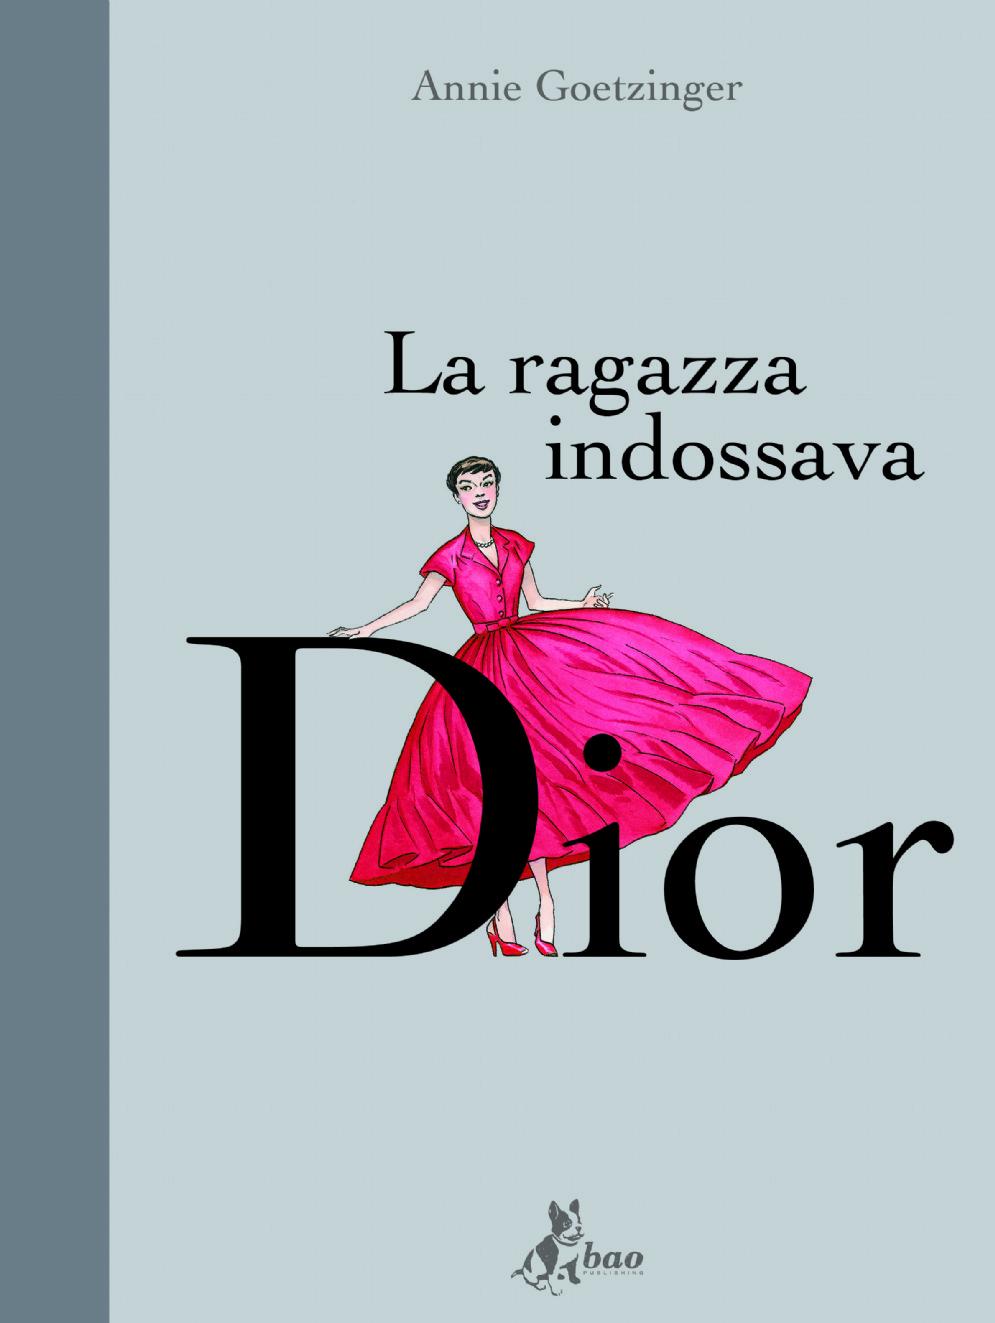 La ragazza indossava Dior, copertina